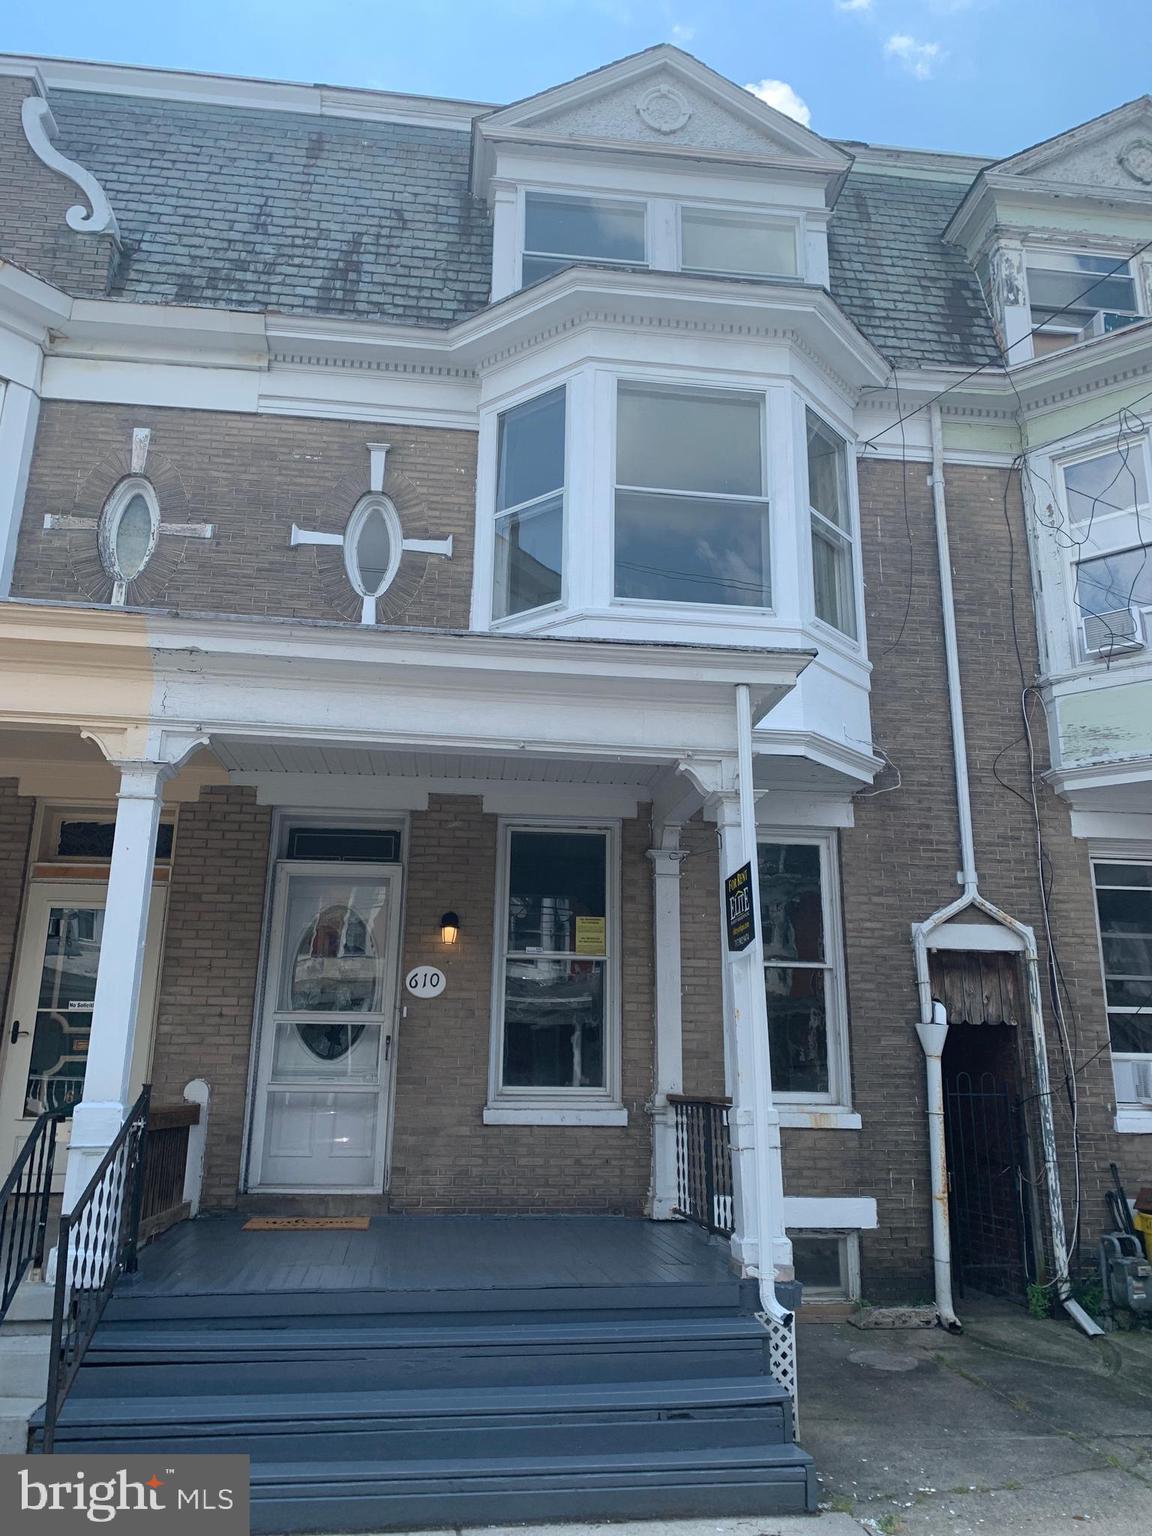 610 W King Street, York, PA 17401